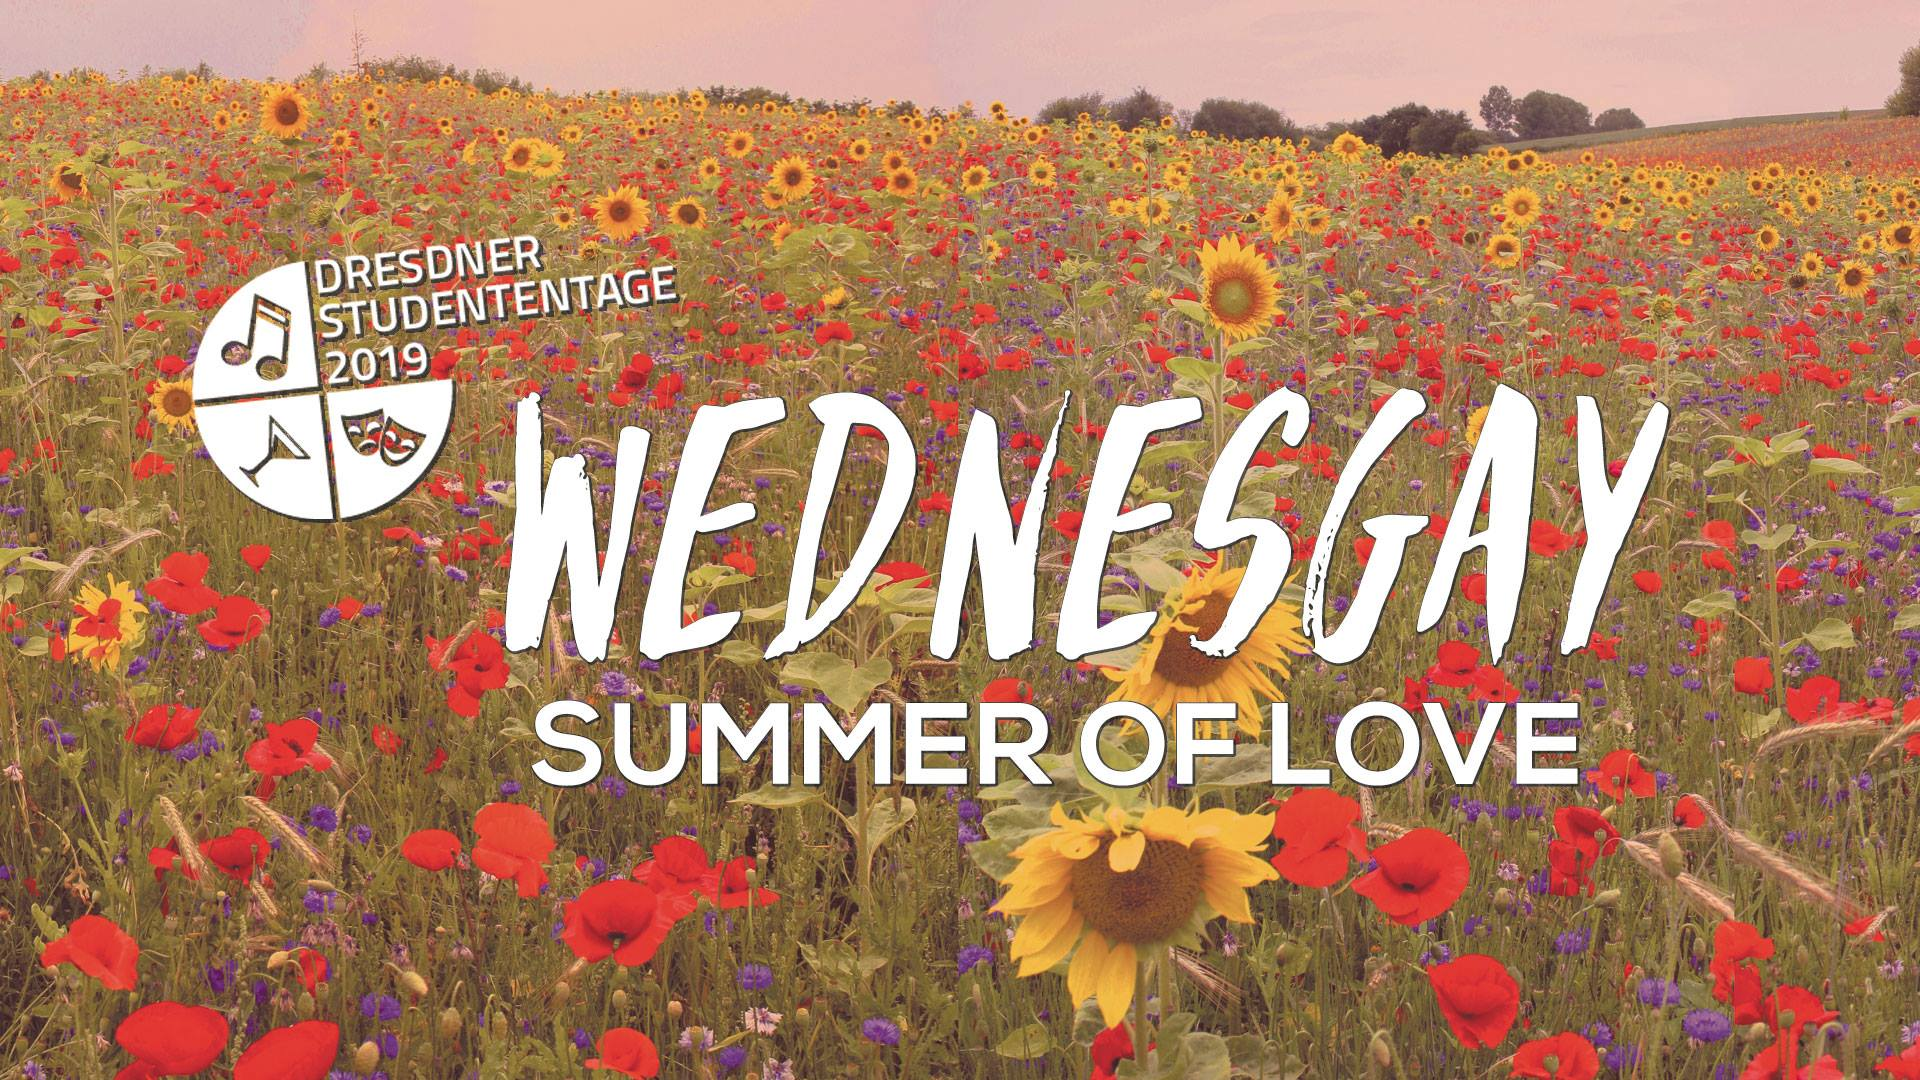 Wednesgay: Summer of Love